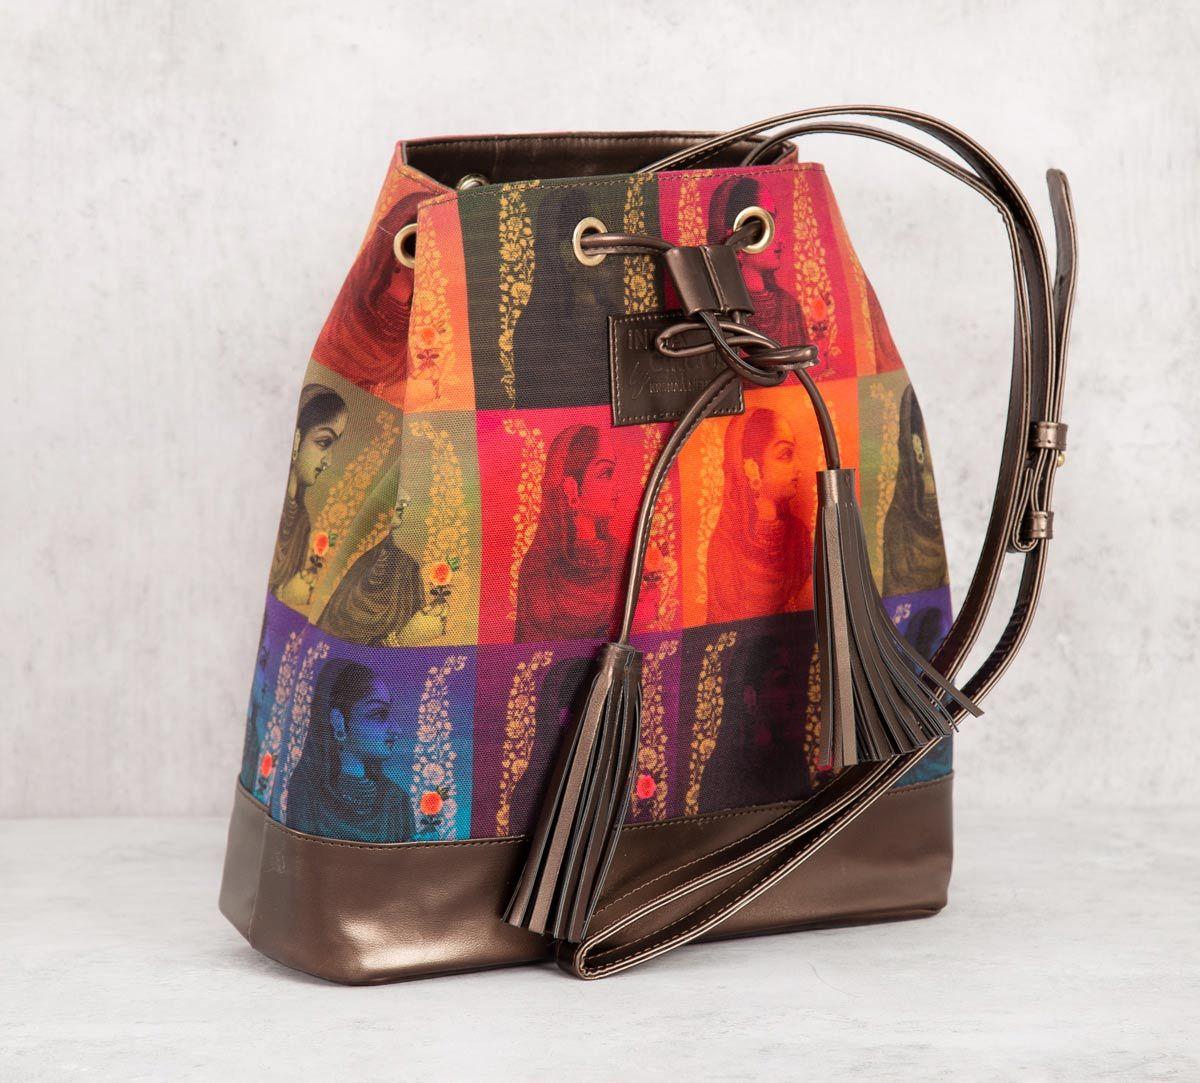 India Circus Tinted Queen Hobo Bag